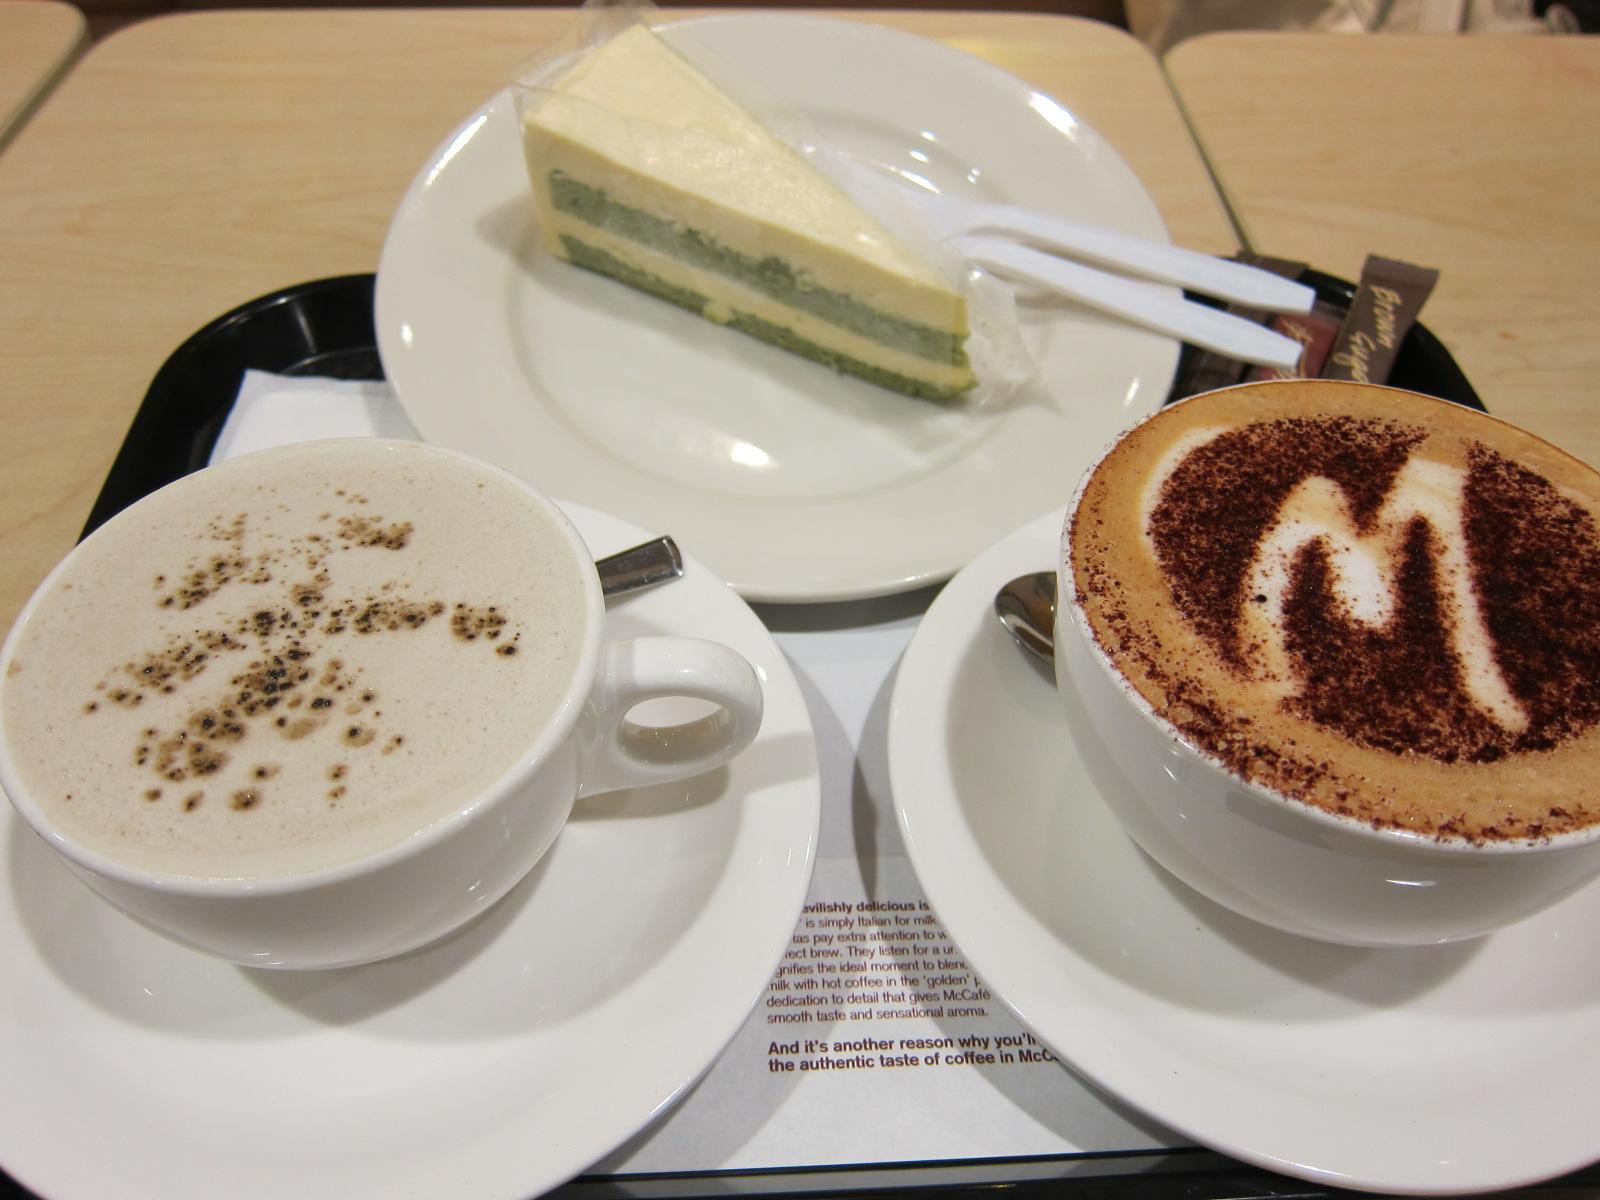 Hong-Kong-McDonalds-Mccafe